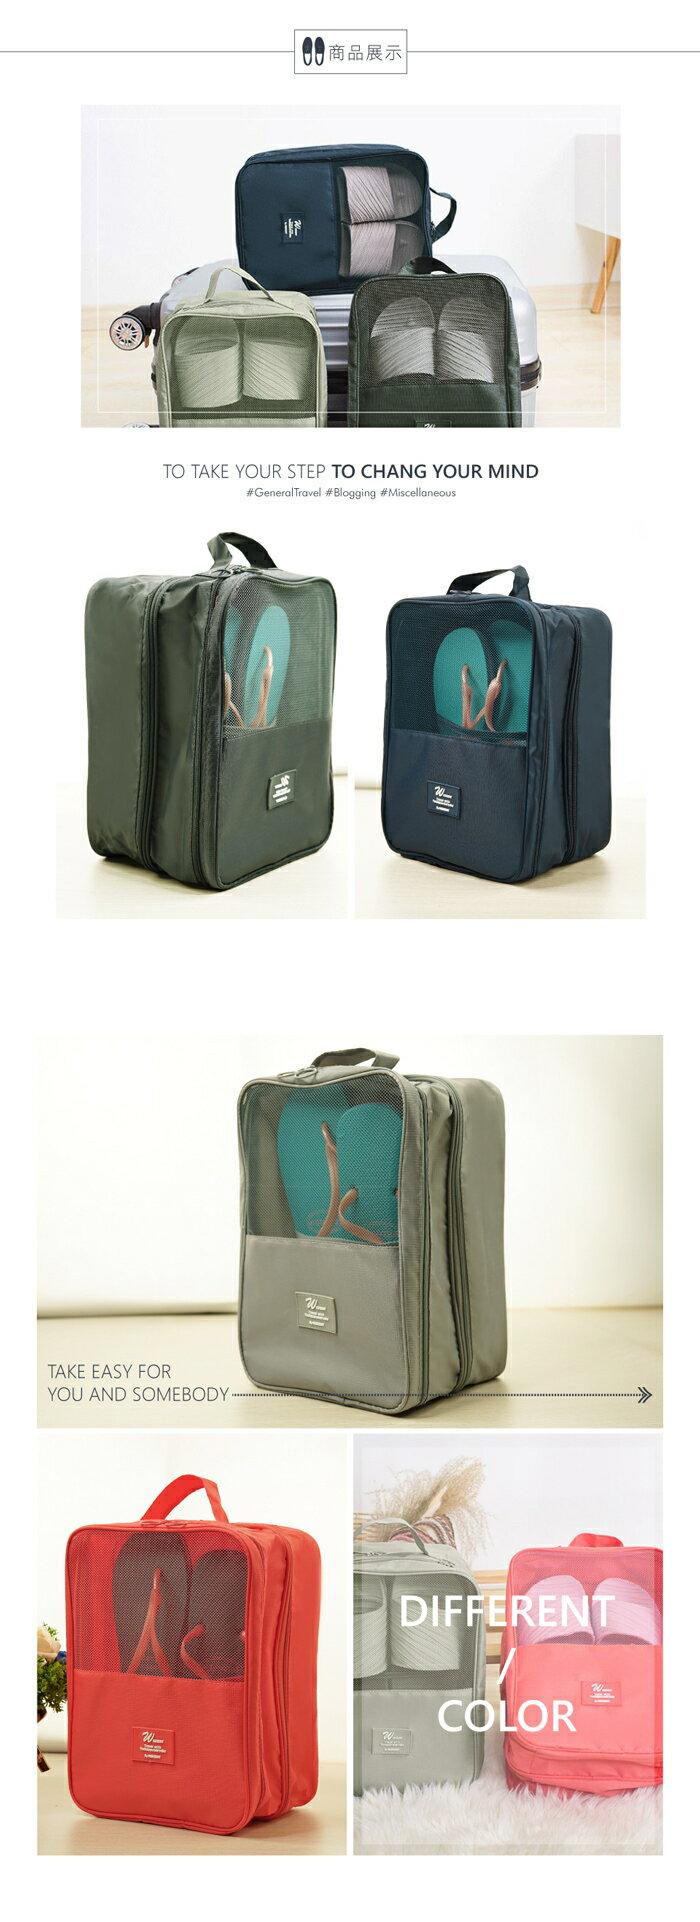 JIDA 簡約乾濕兩用雙層手提鞋袋-顏色隨機出貨(31X23X19cm) [大買家] 2